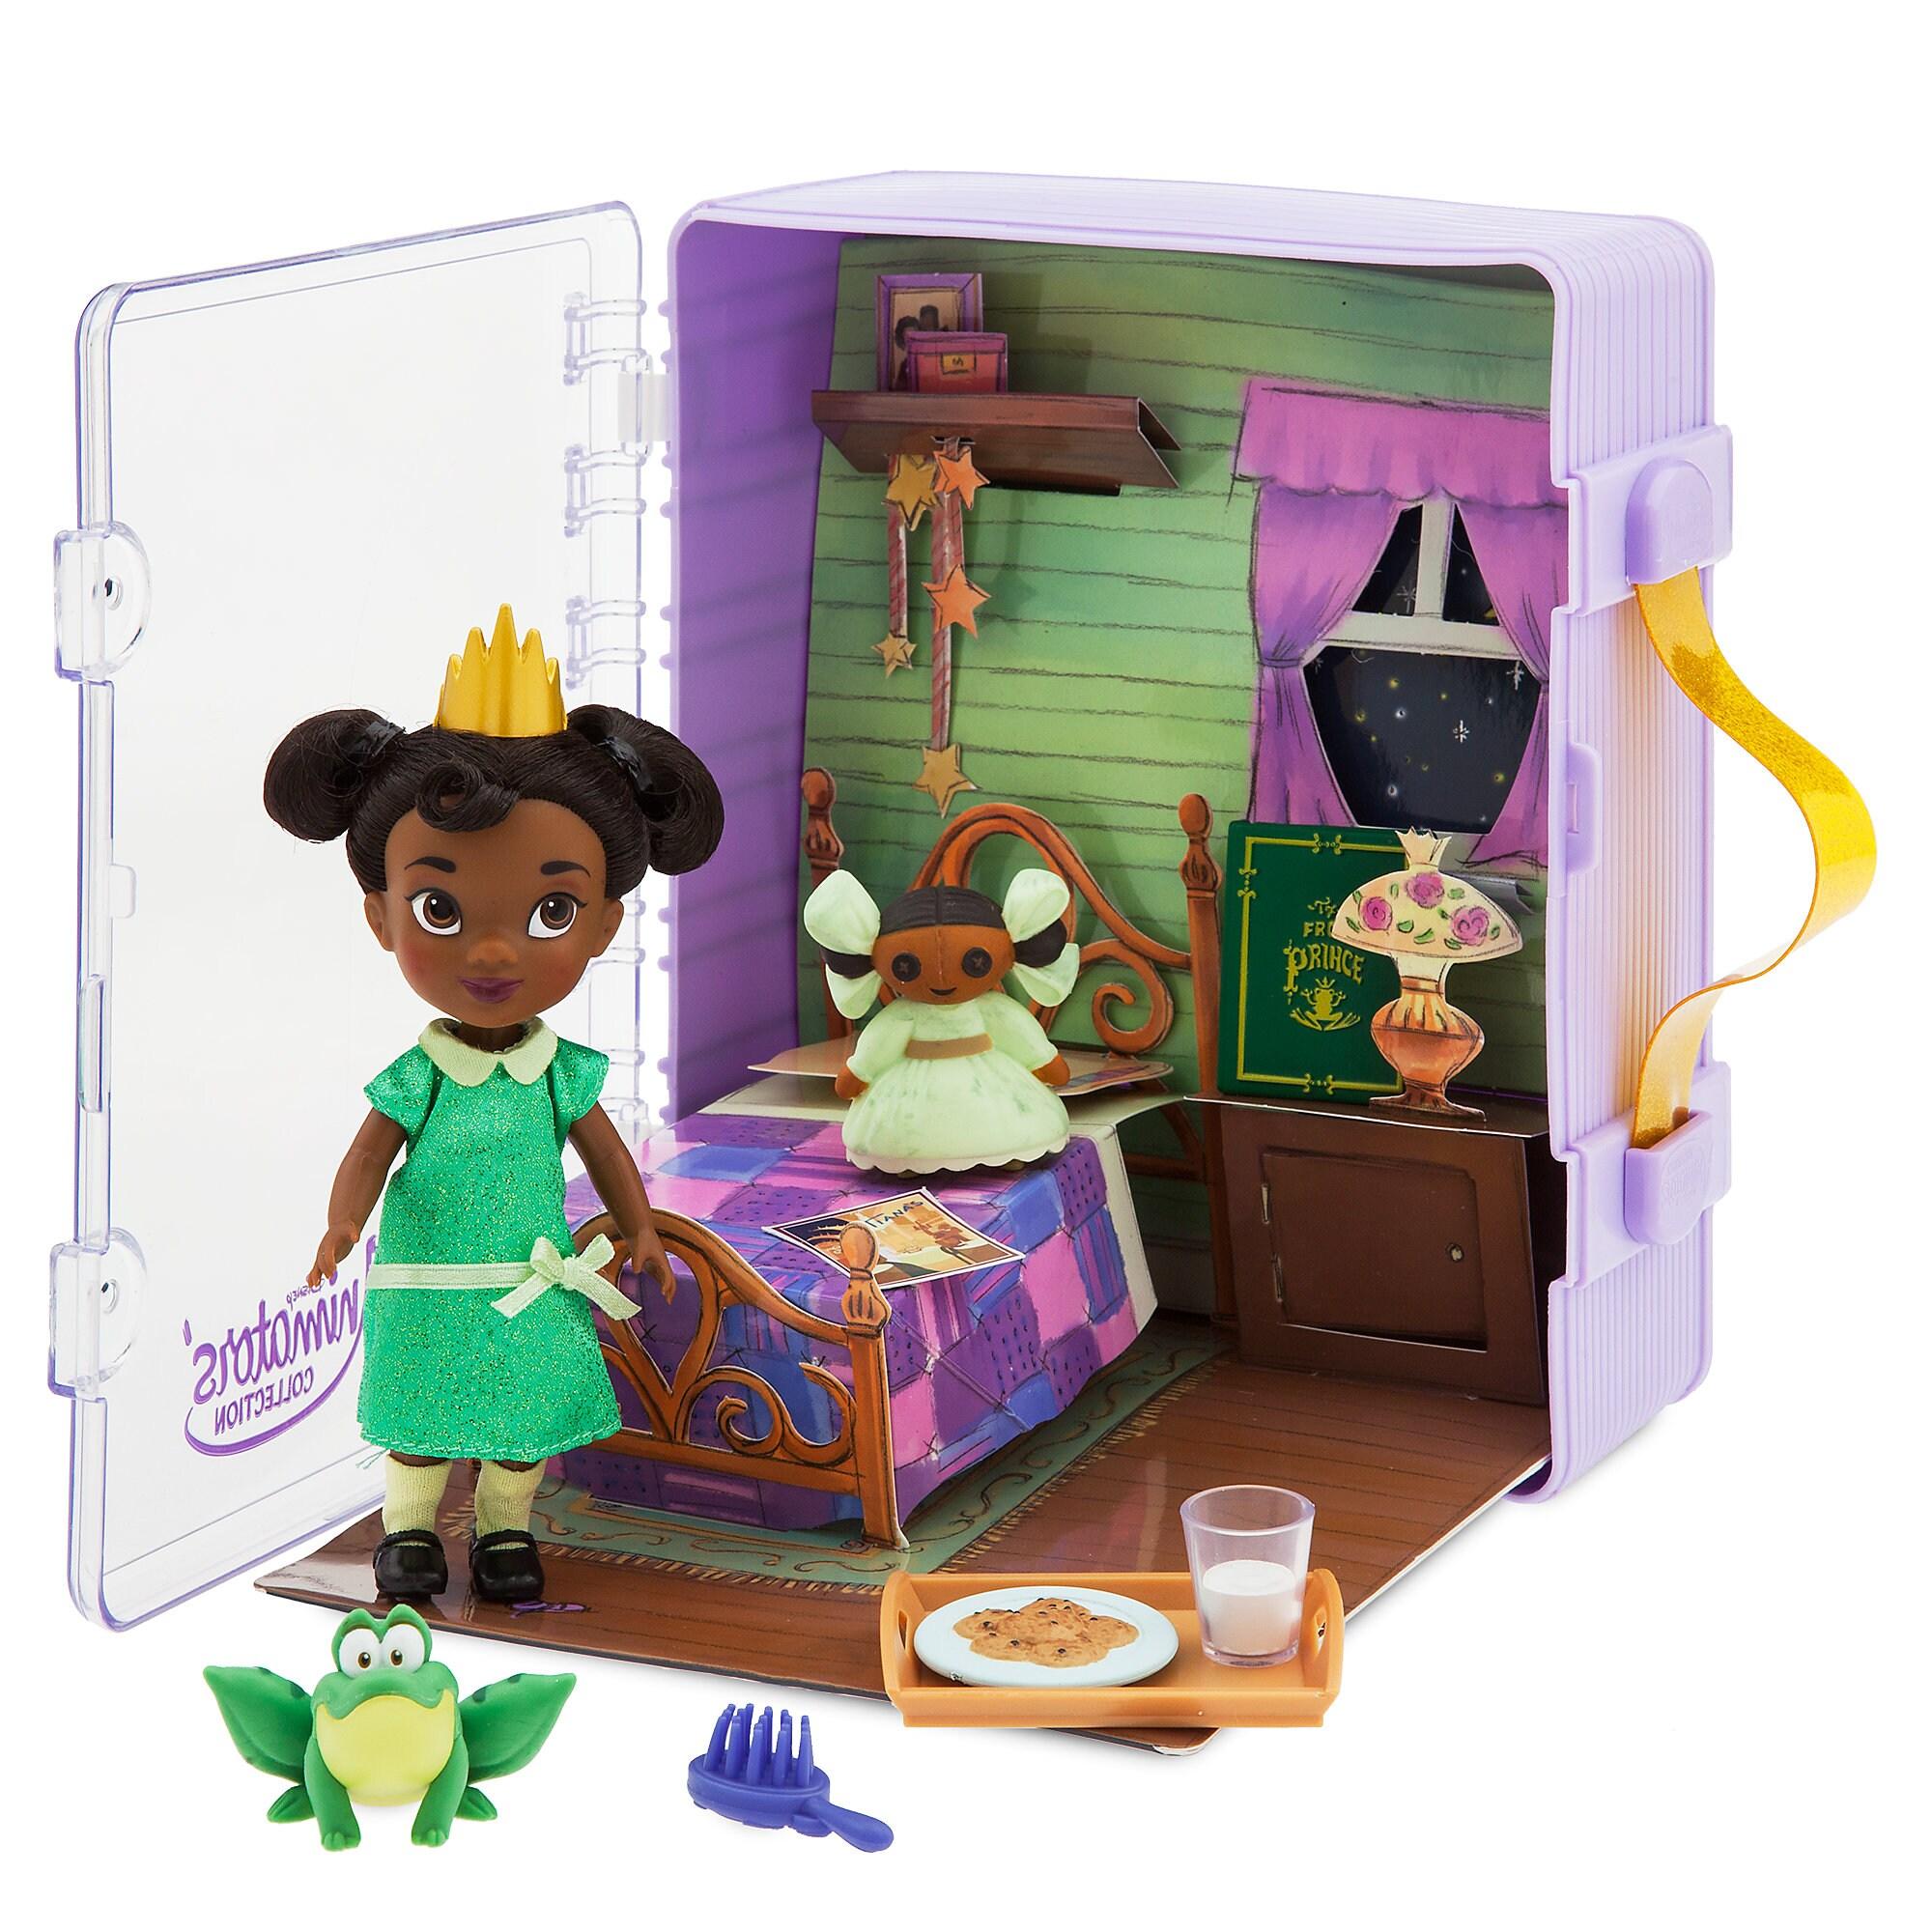 Disney Animators Collection Tiana Mini Doll Play Set Is